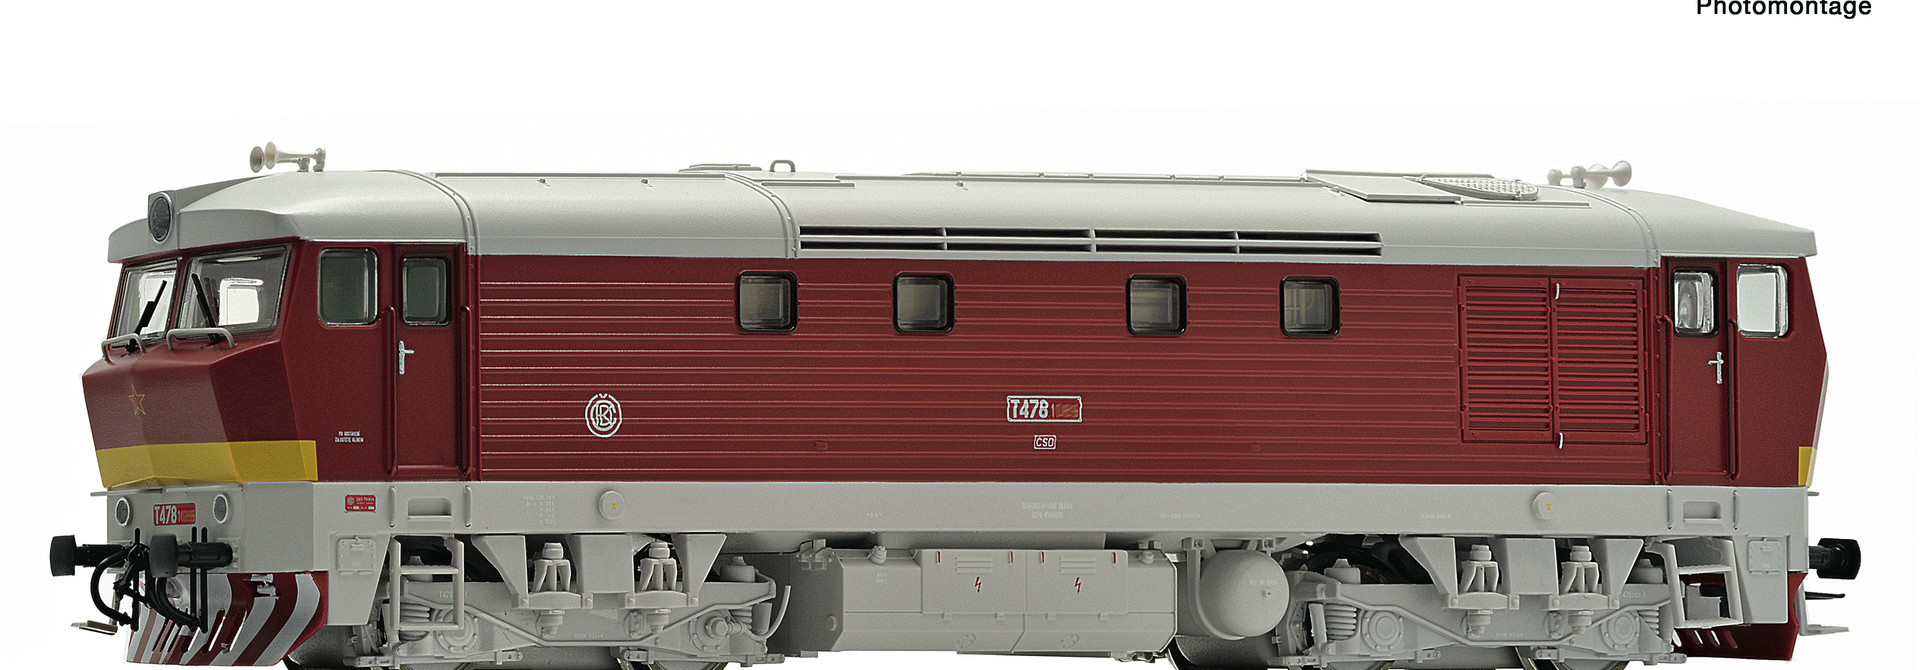 70920 Diesellok T478.1 CSD